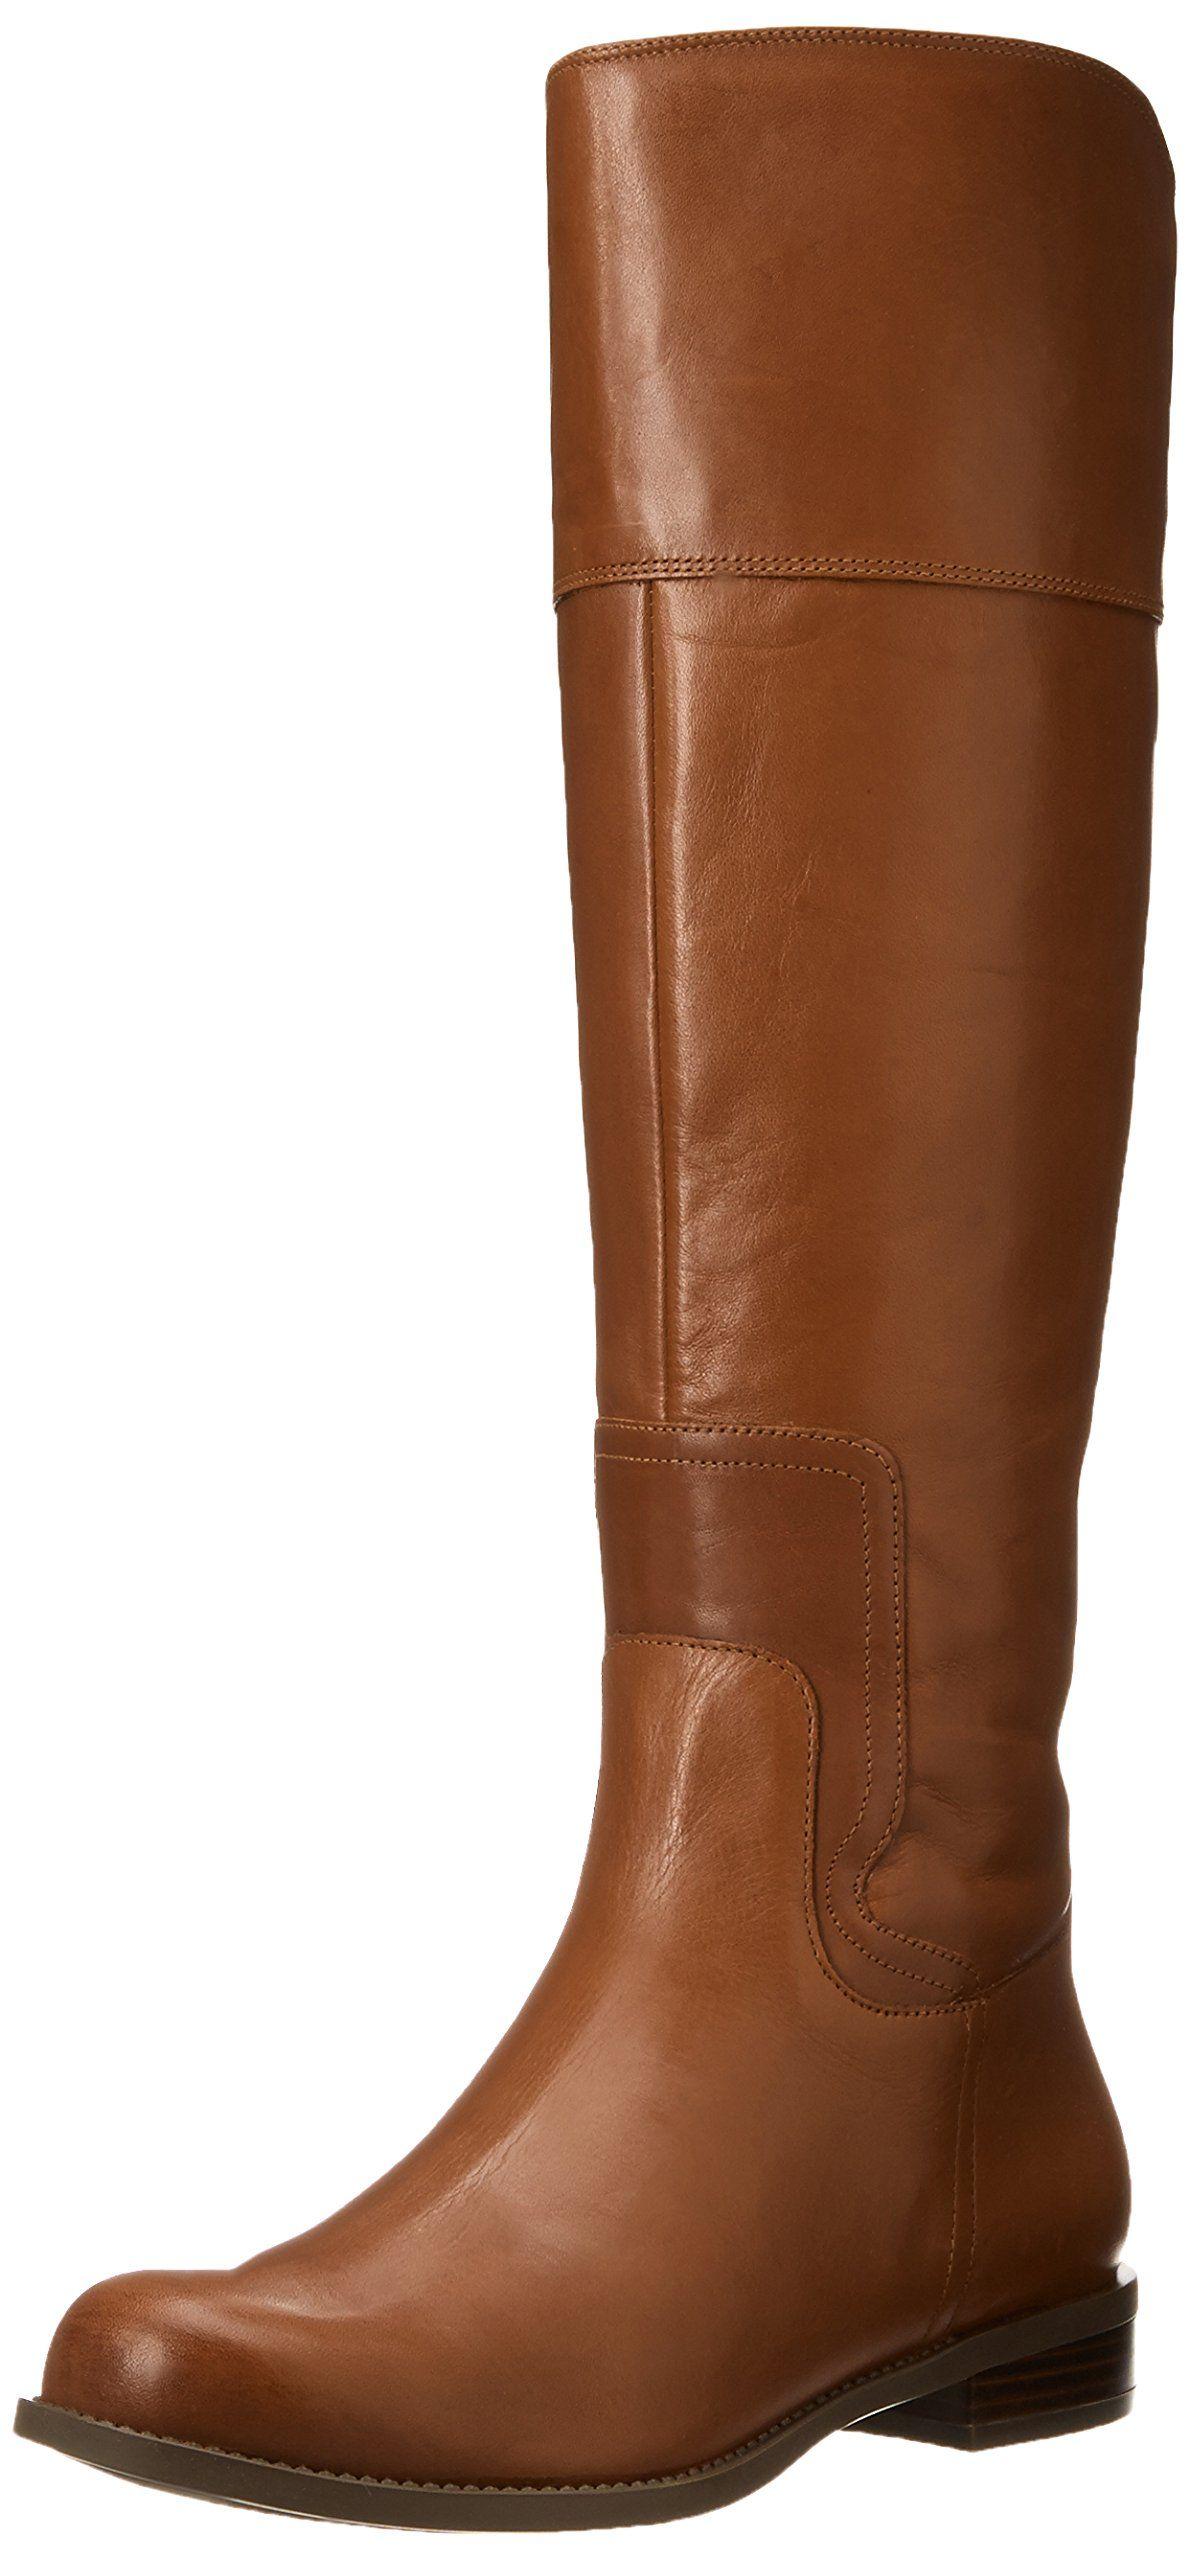 Amazon.com: Nine West Women's Cromie Riding Boot,Dark Natural ...